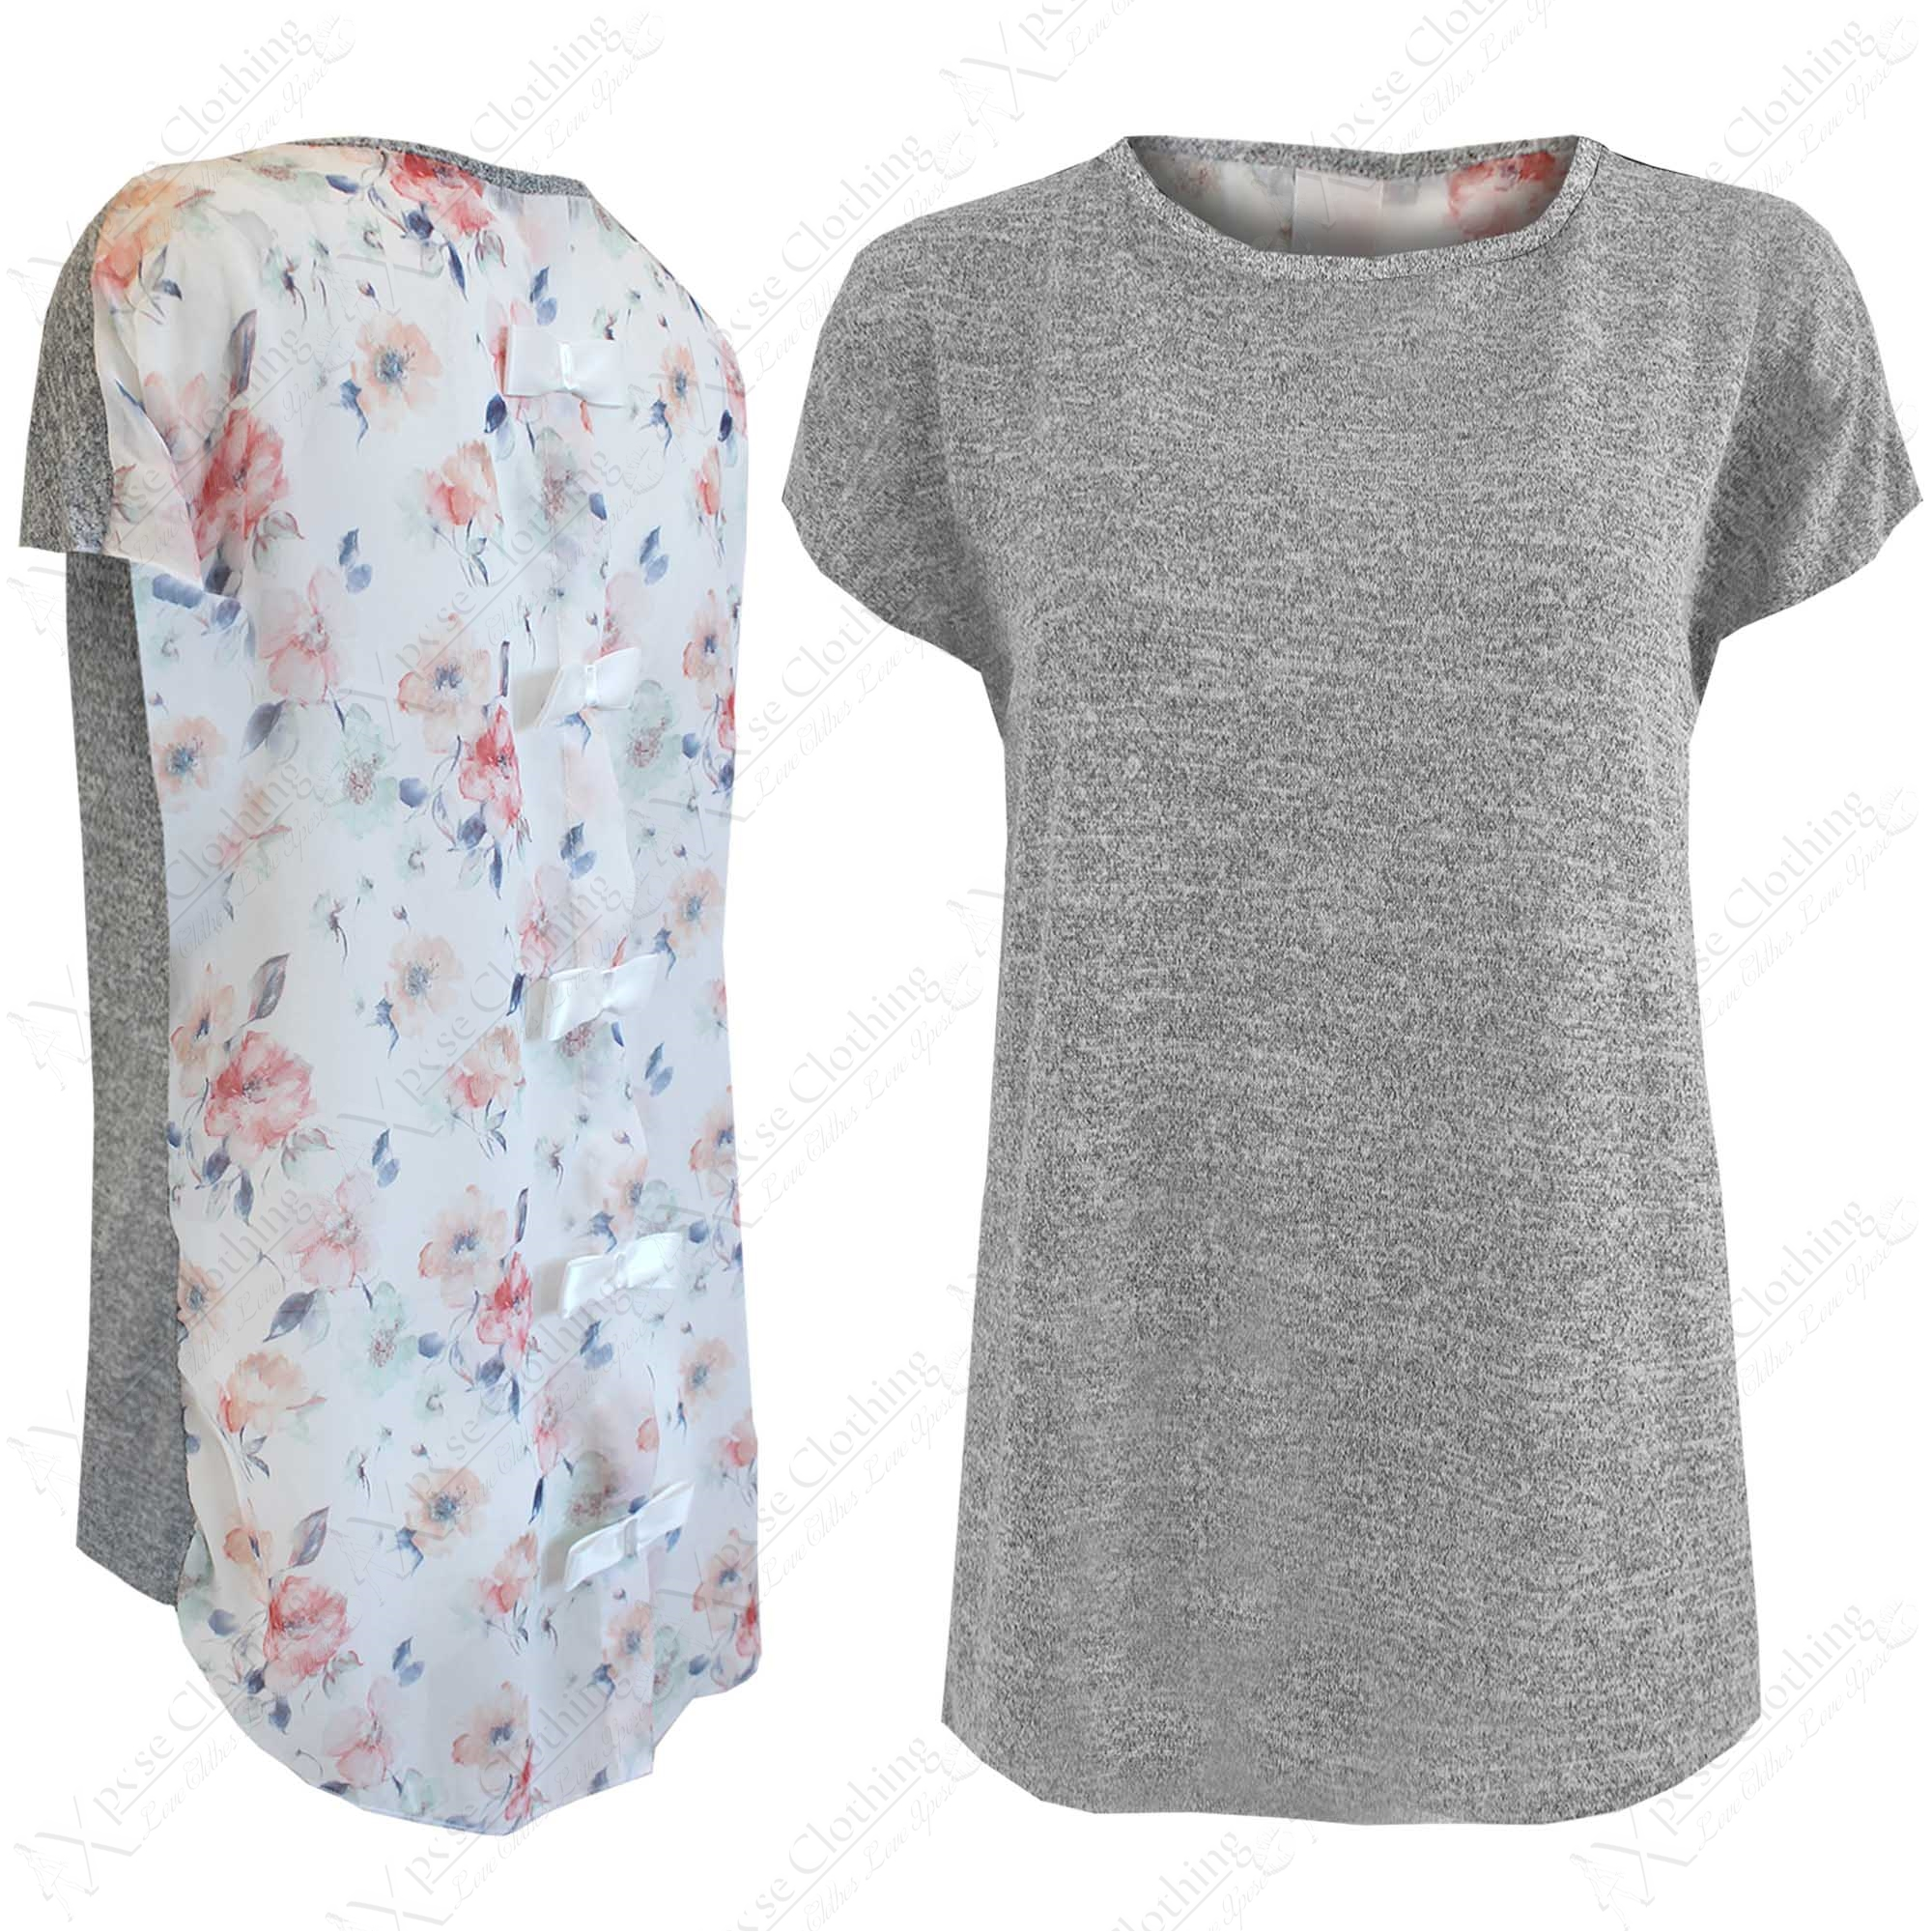 New ladies floral chiffon bow back tops women grey marl for Grey marl t shirt